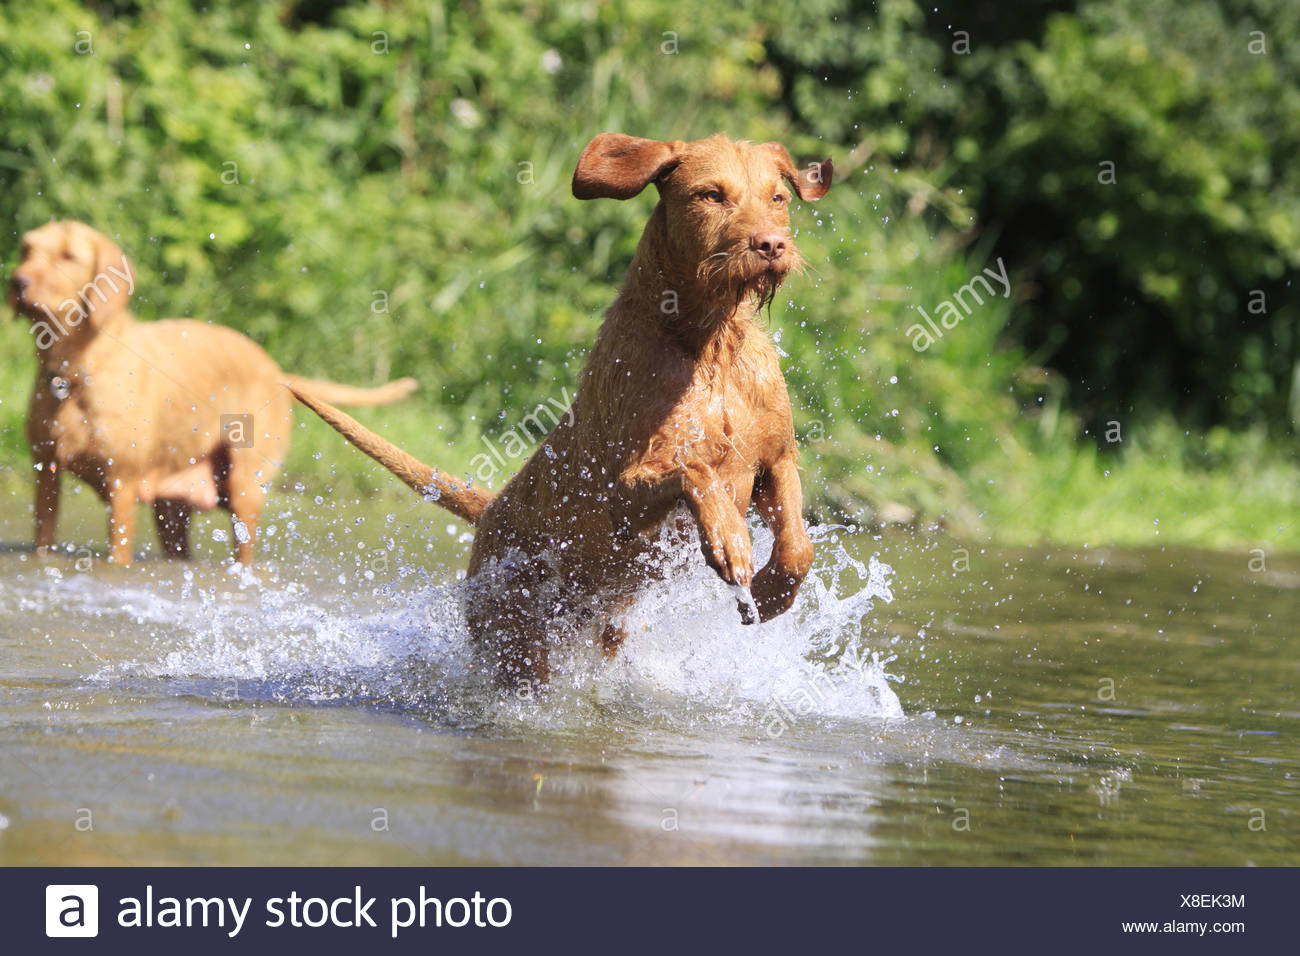 Wirehaired Magyar Vizsla dog - running in snow - Stock Image